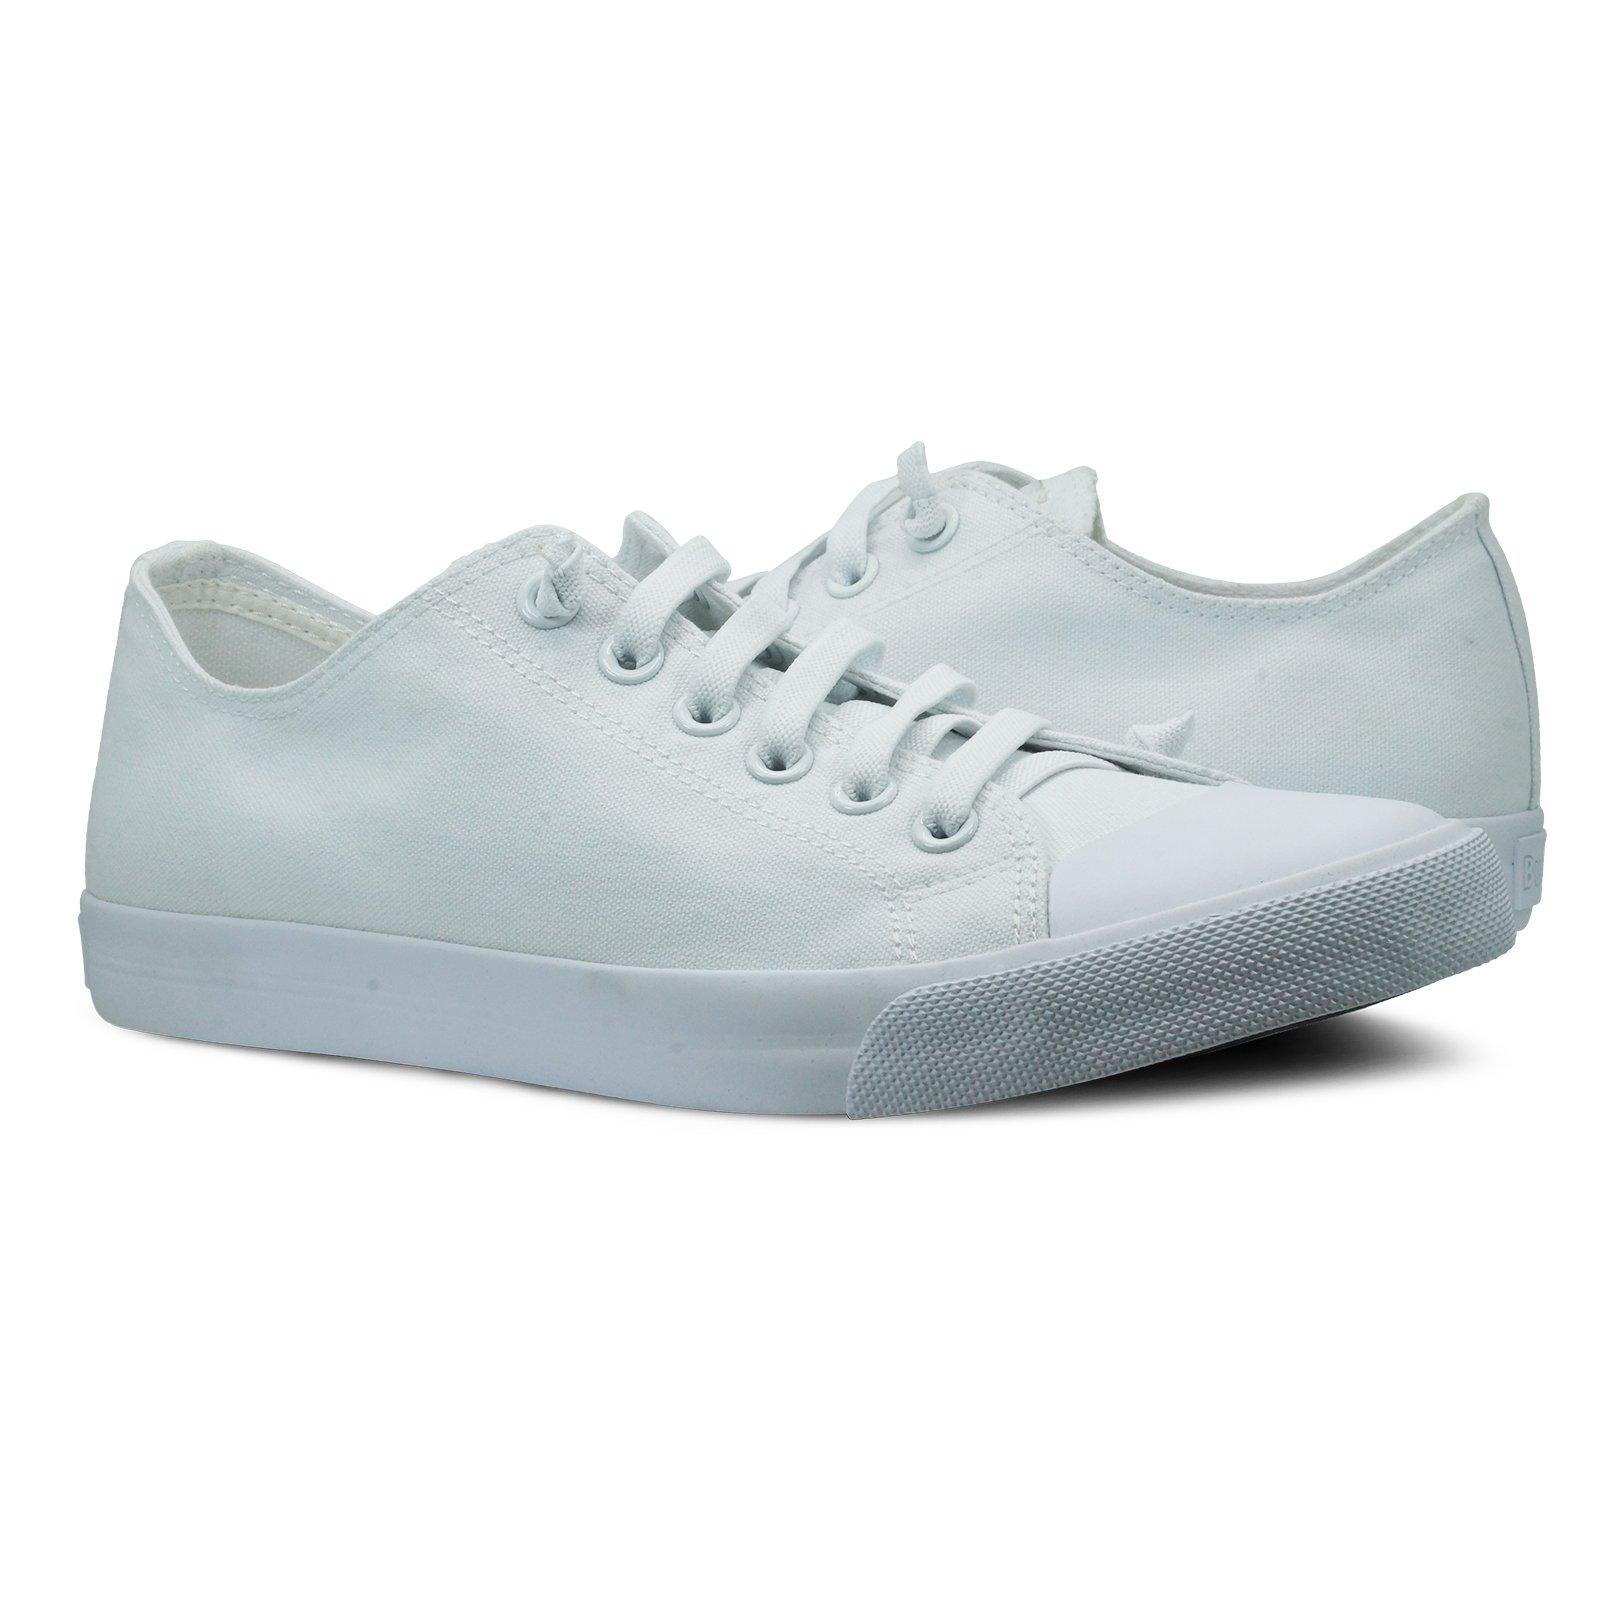 Burnetie Men's White Canvas Ox Low top Sneaker 8 M US